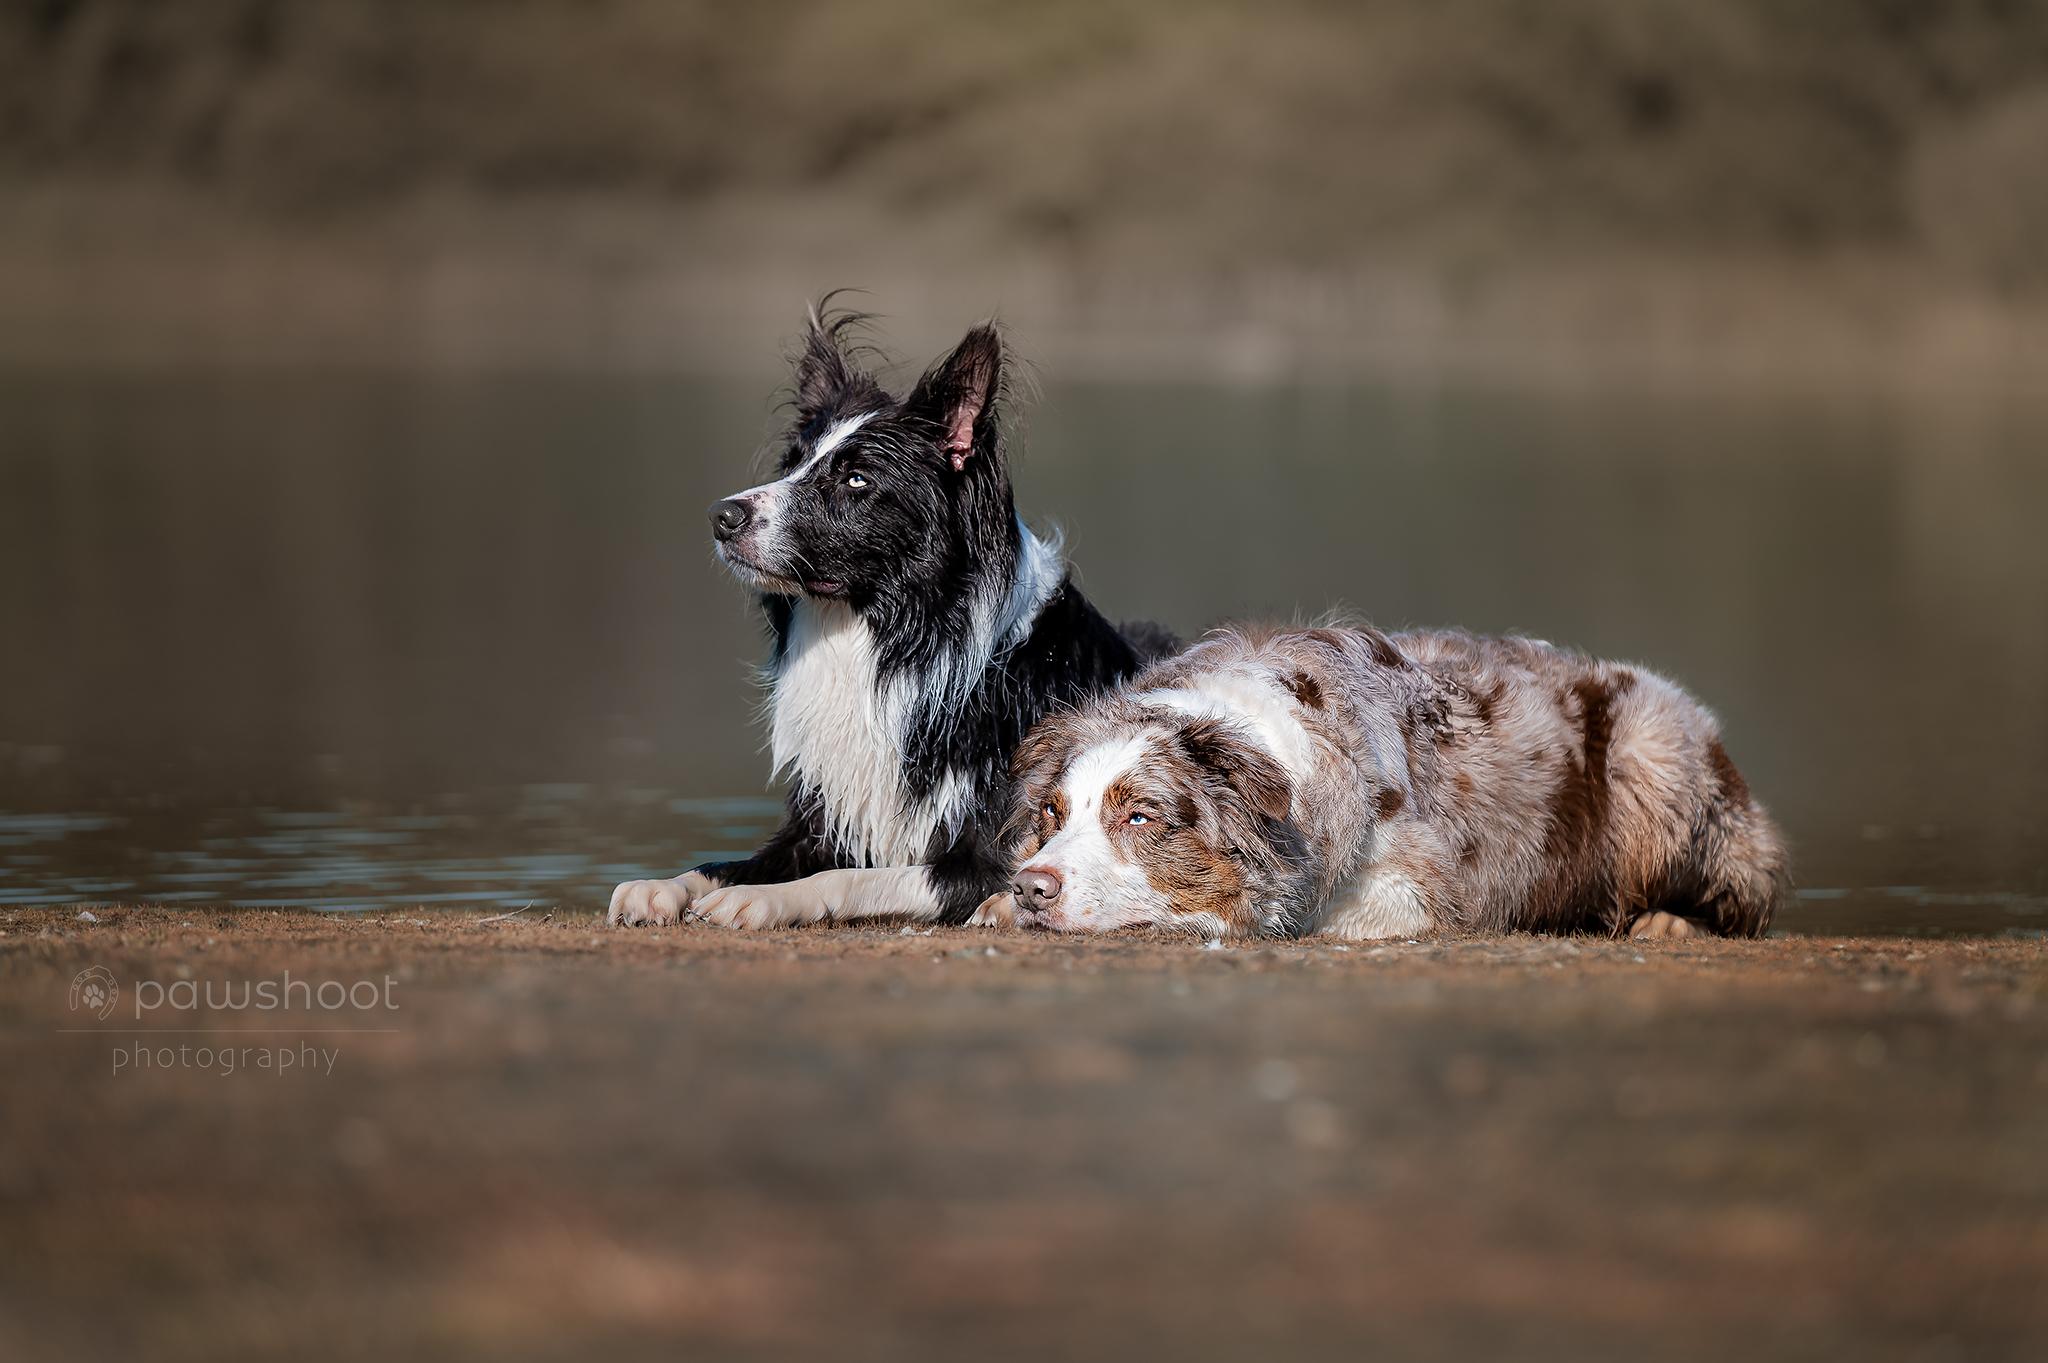 hondenportret Pawshoot hondenfotografie